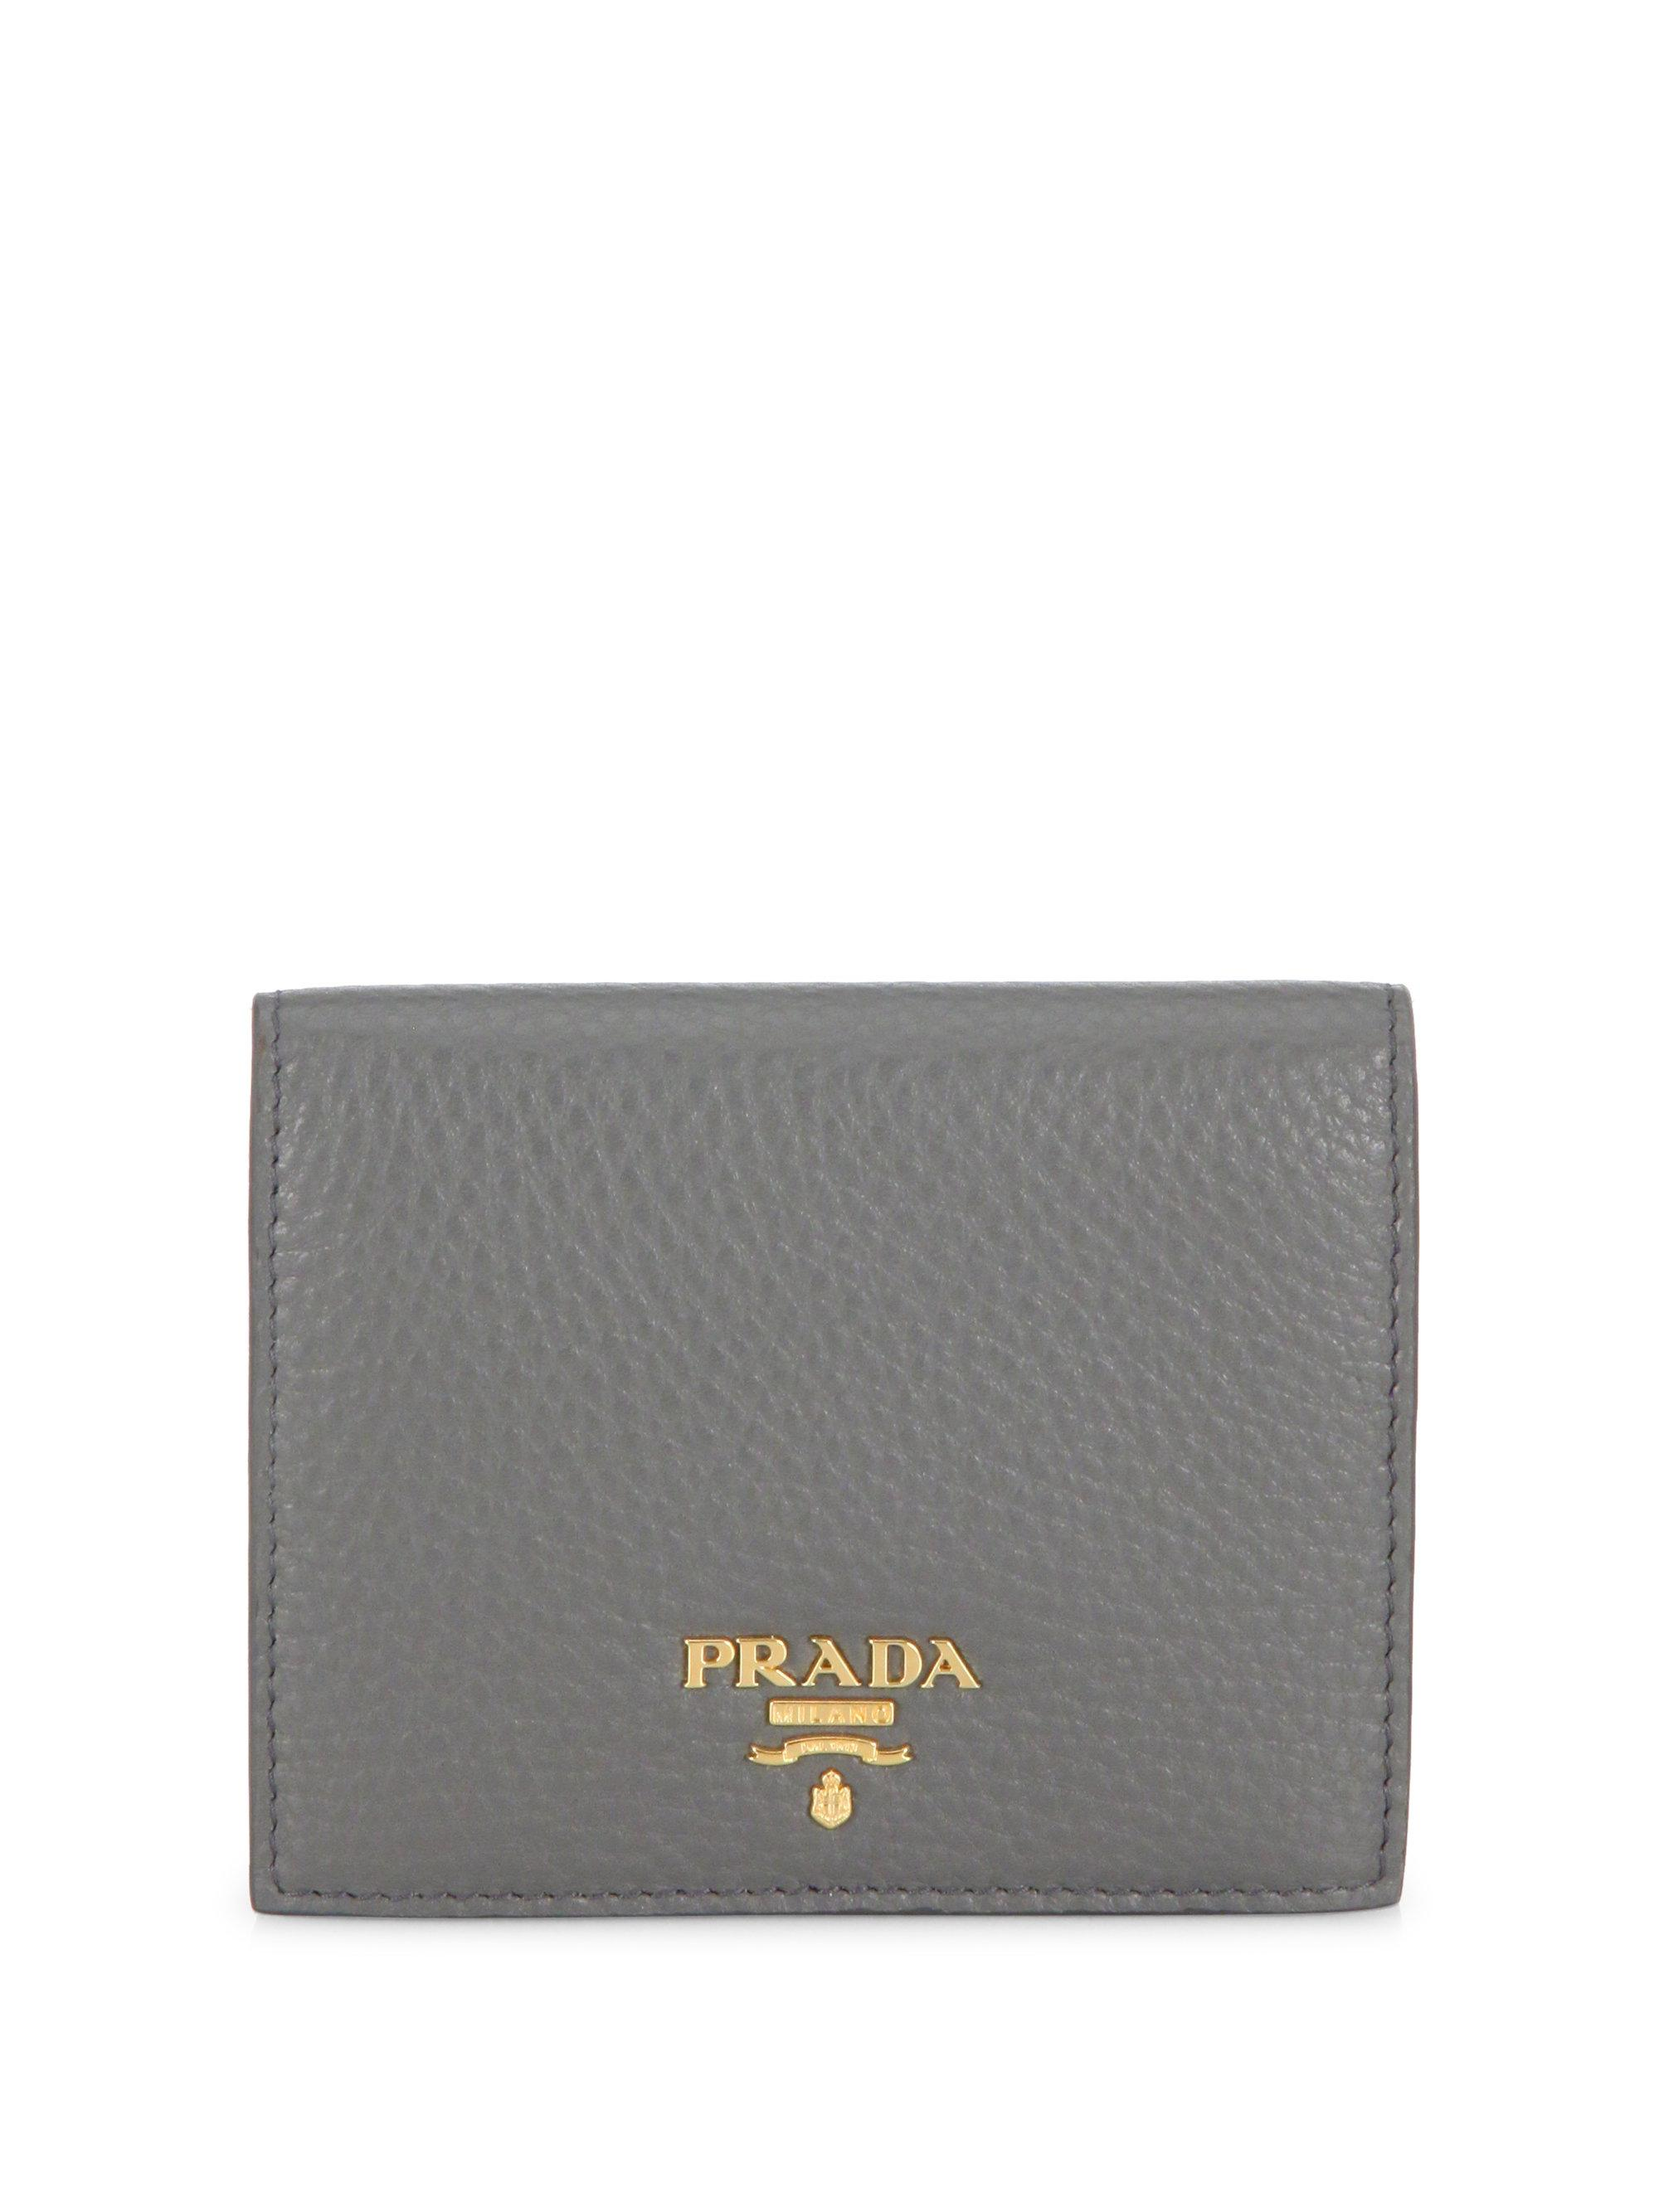 prada shoes vs ferragamo wallet bifold menus